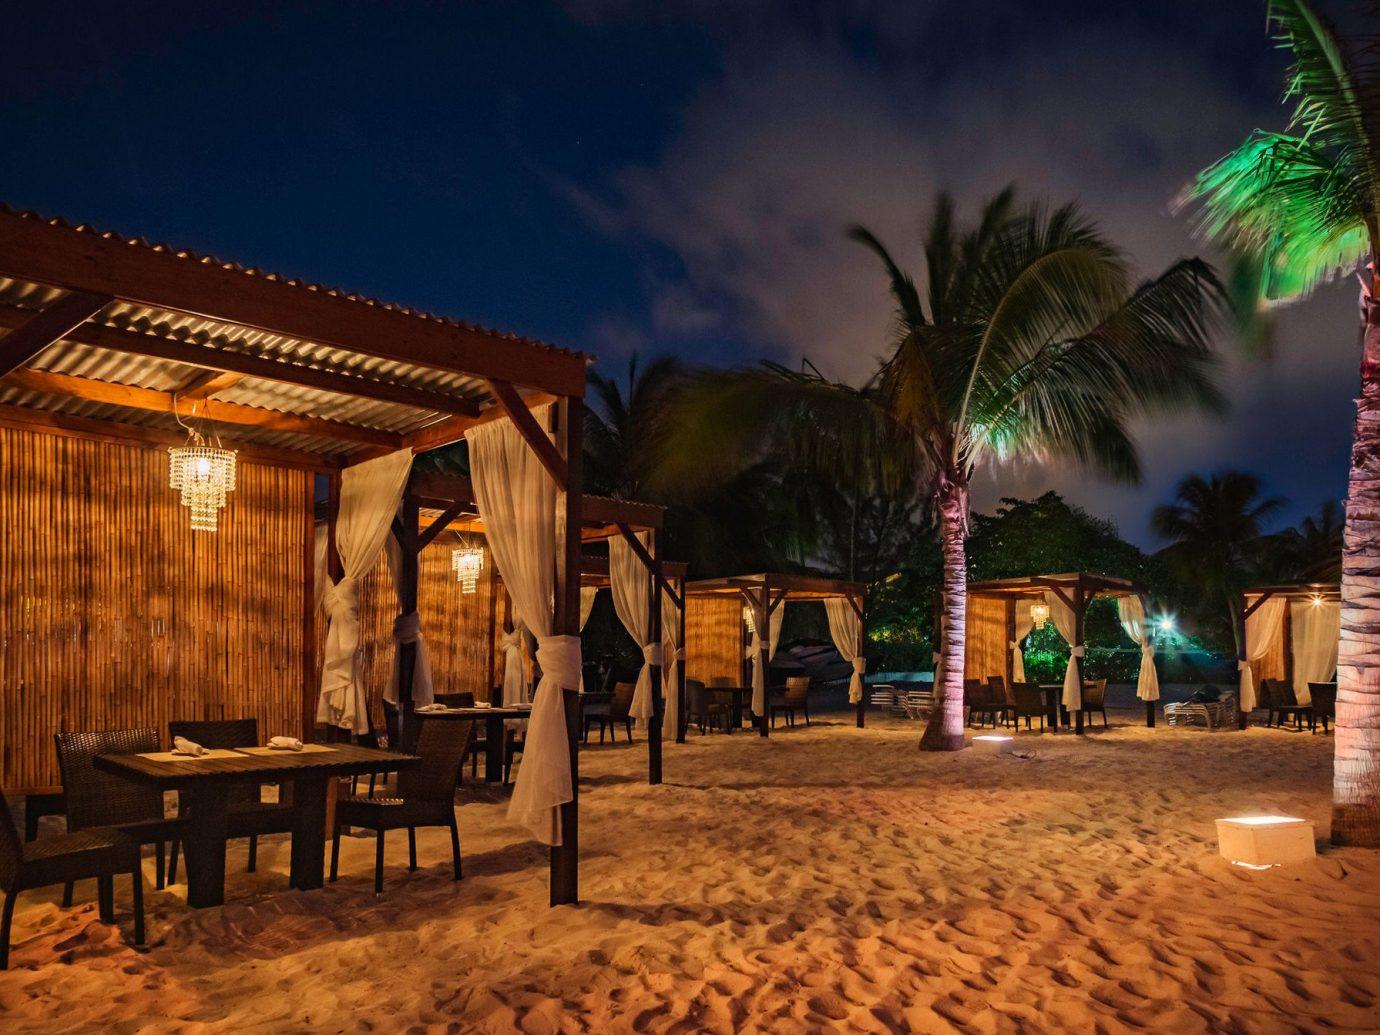 Trip Ideas outdoor night Resort evening estate